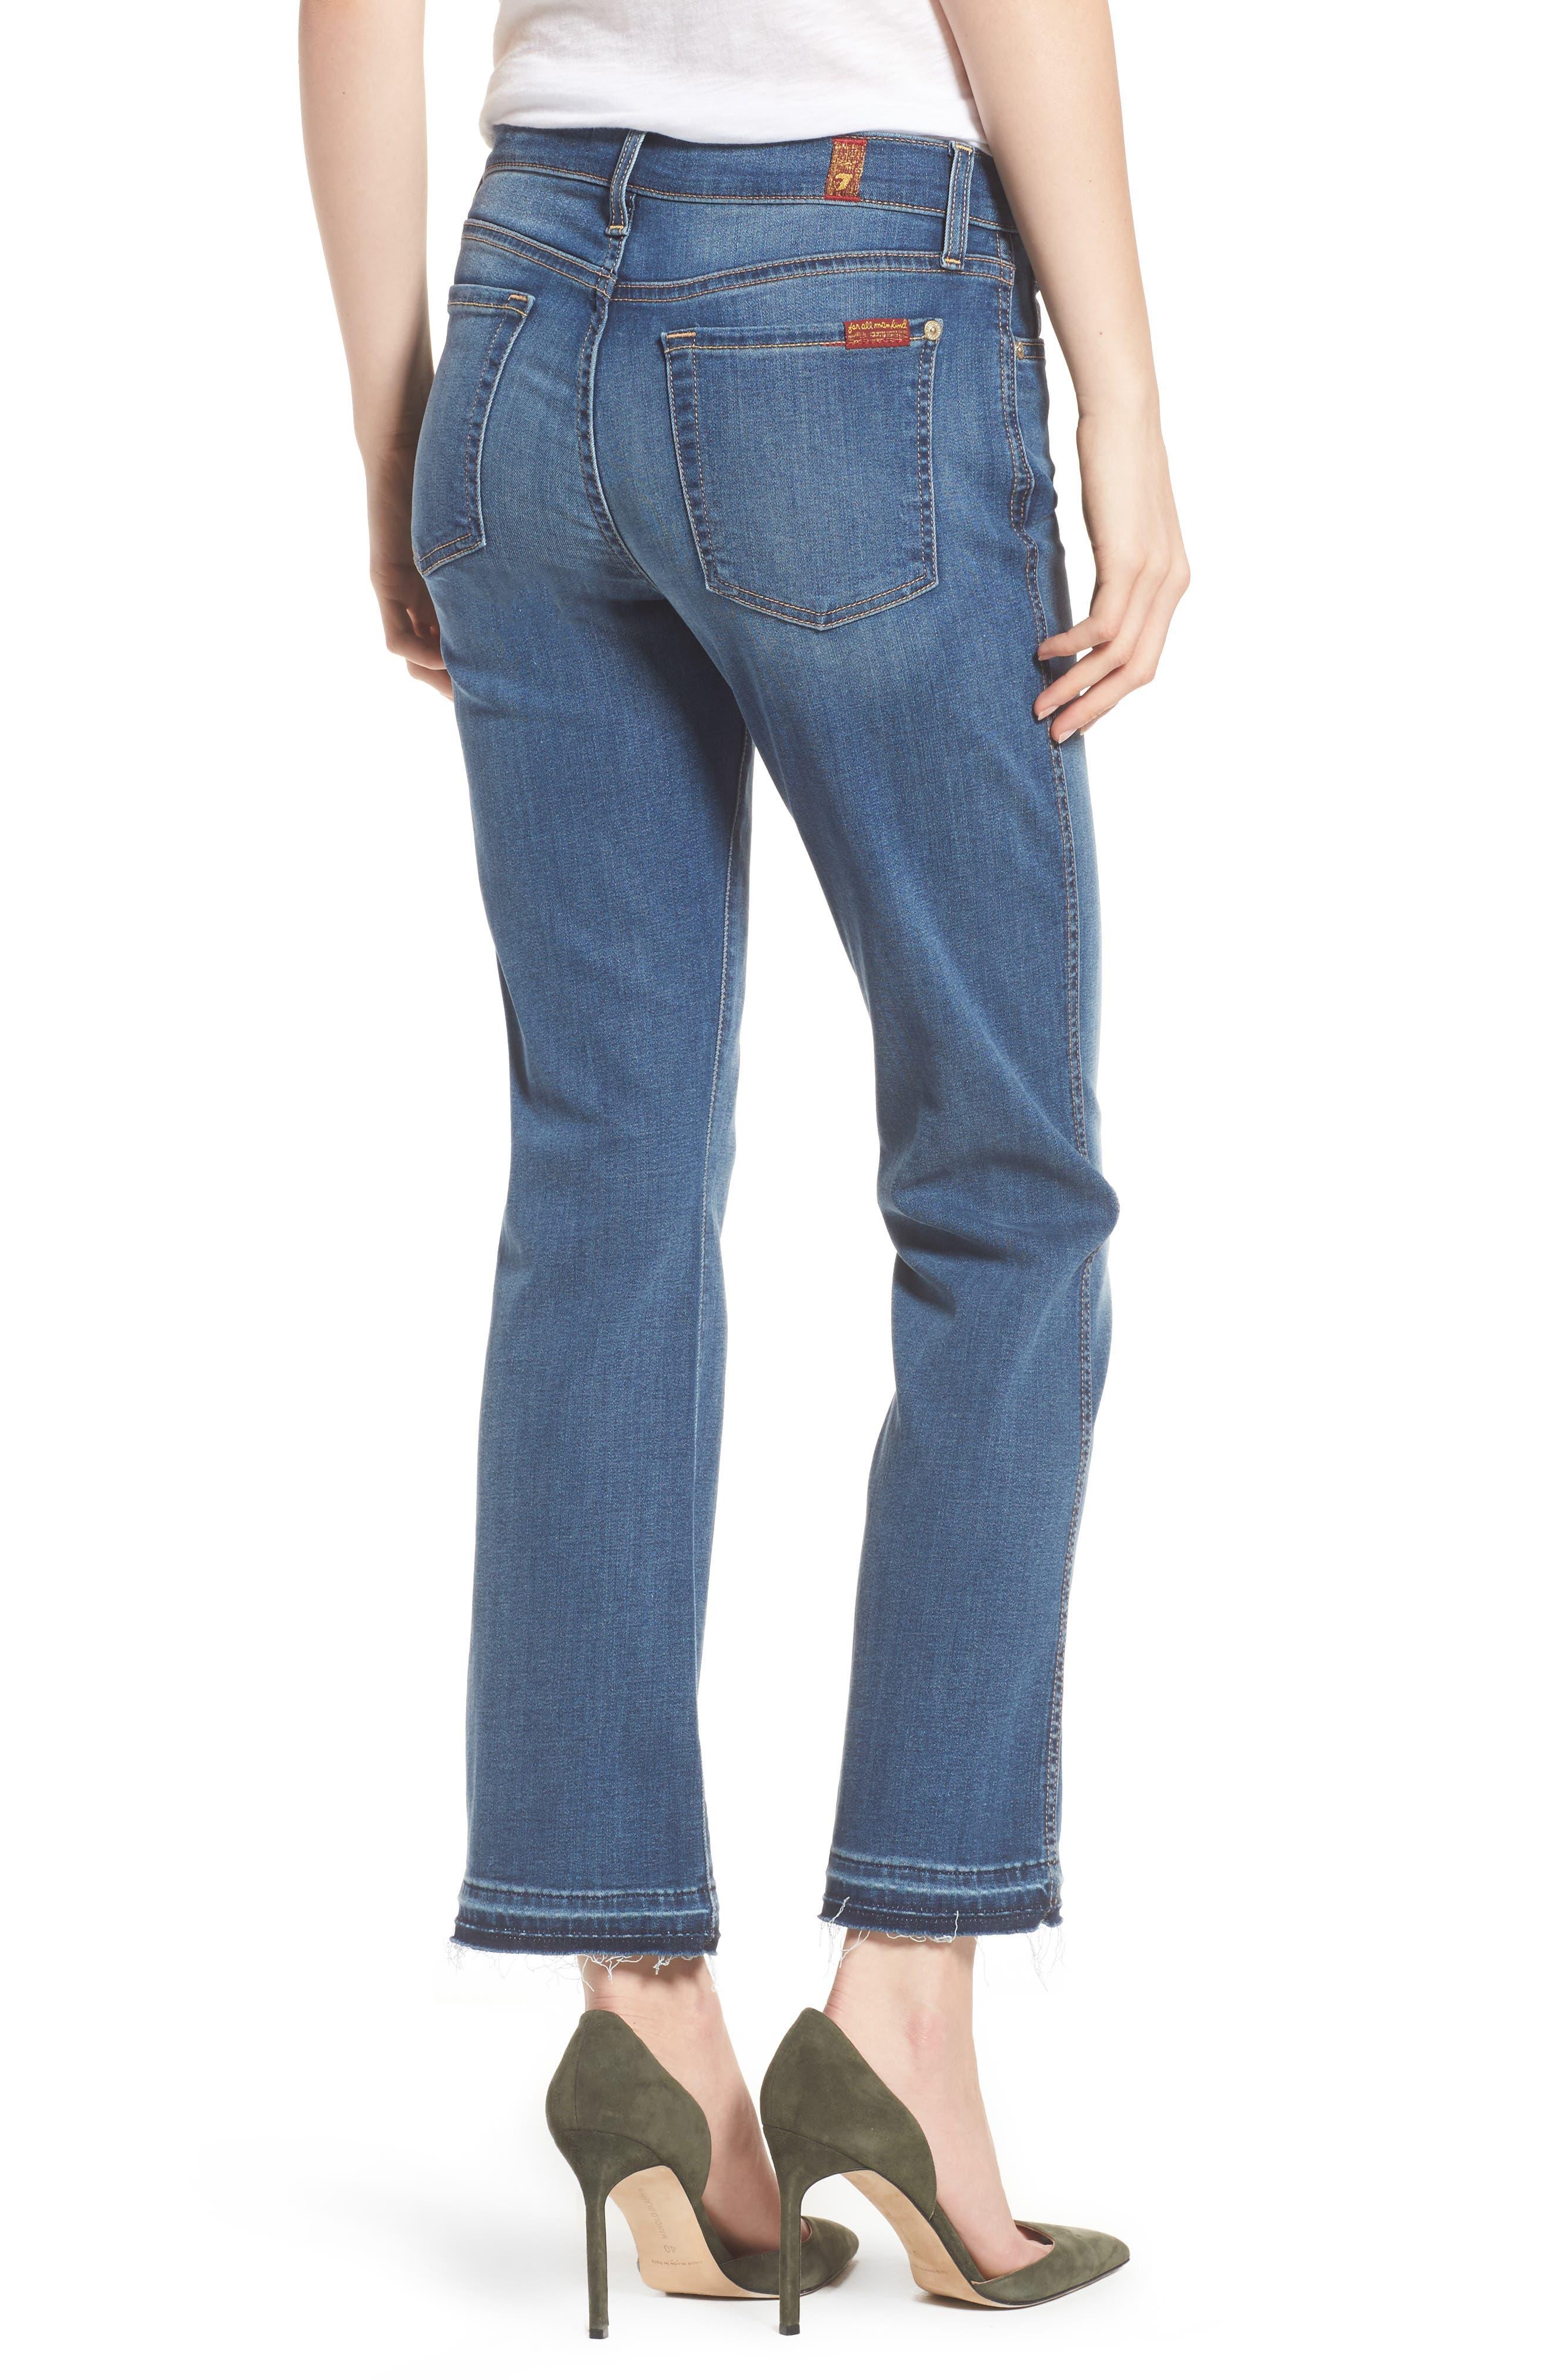 b(air) Crop Bootcut Jeans,                             Alternate thumbnail 2, color,                             Bair Vintage Dusk